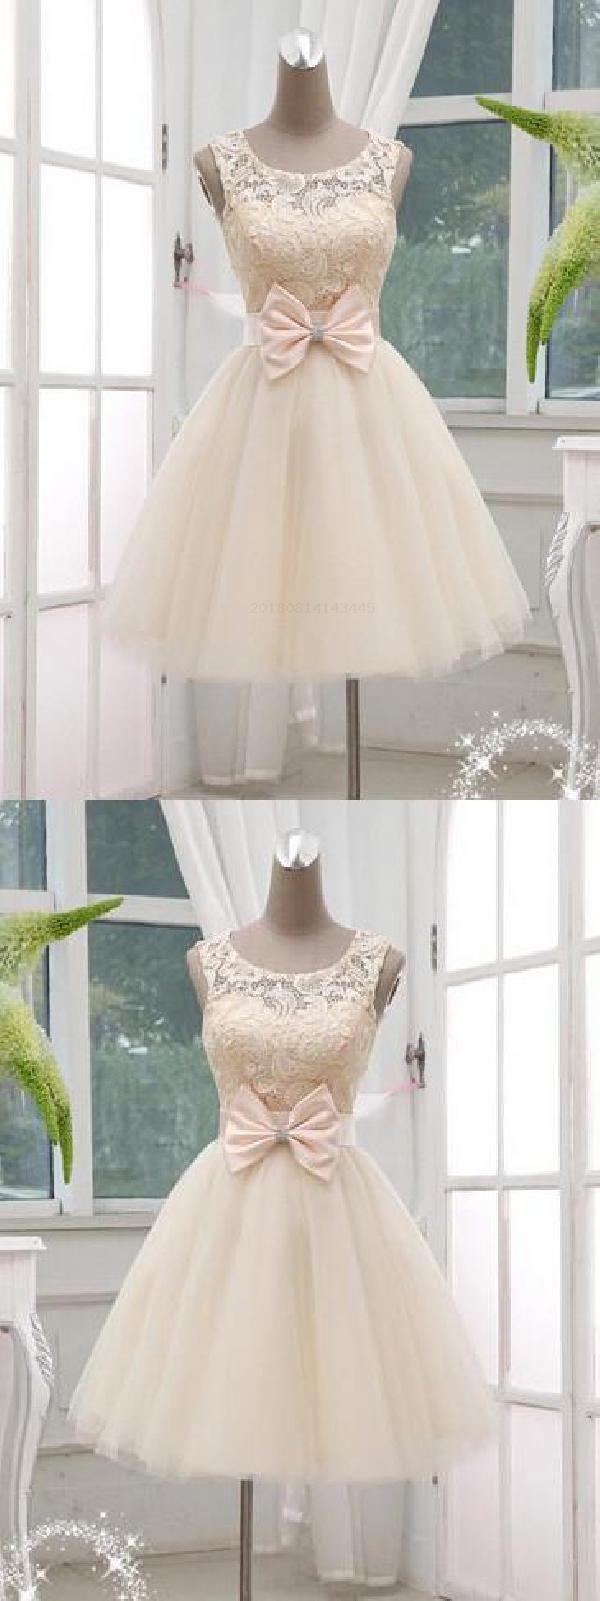 Custom homecoming dresses aline homecoming dresses short